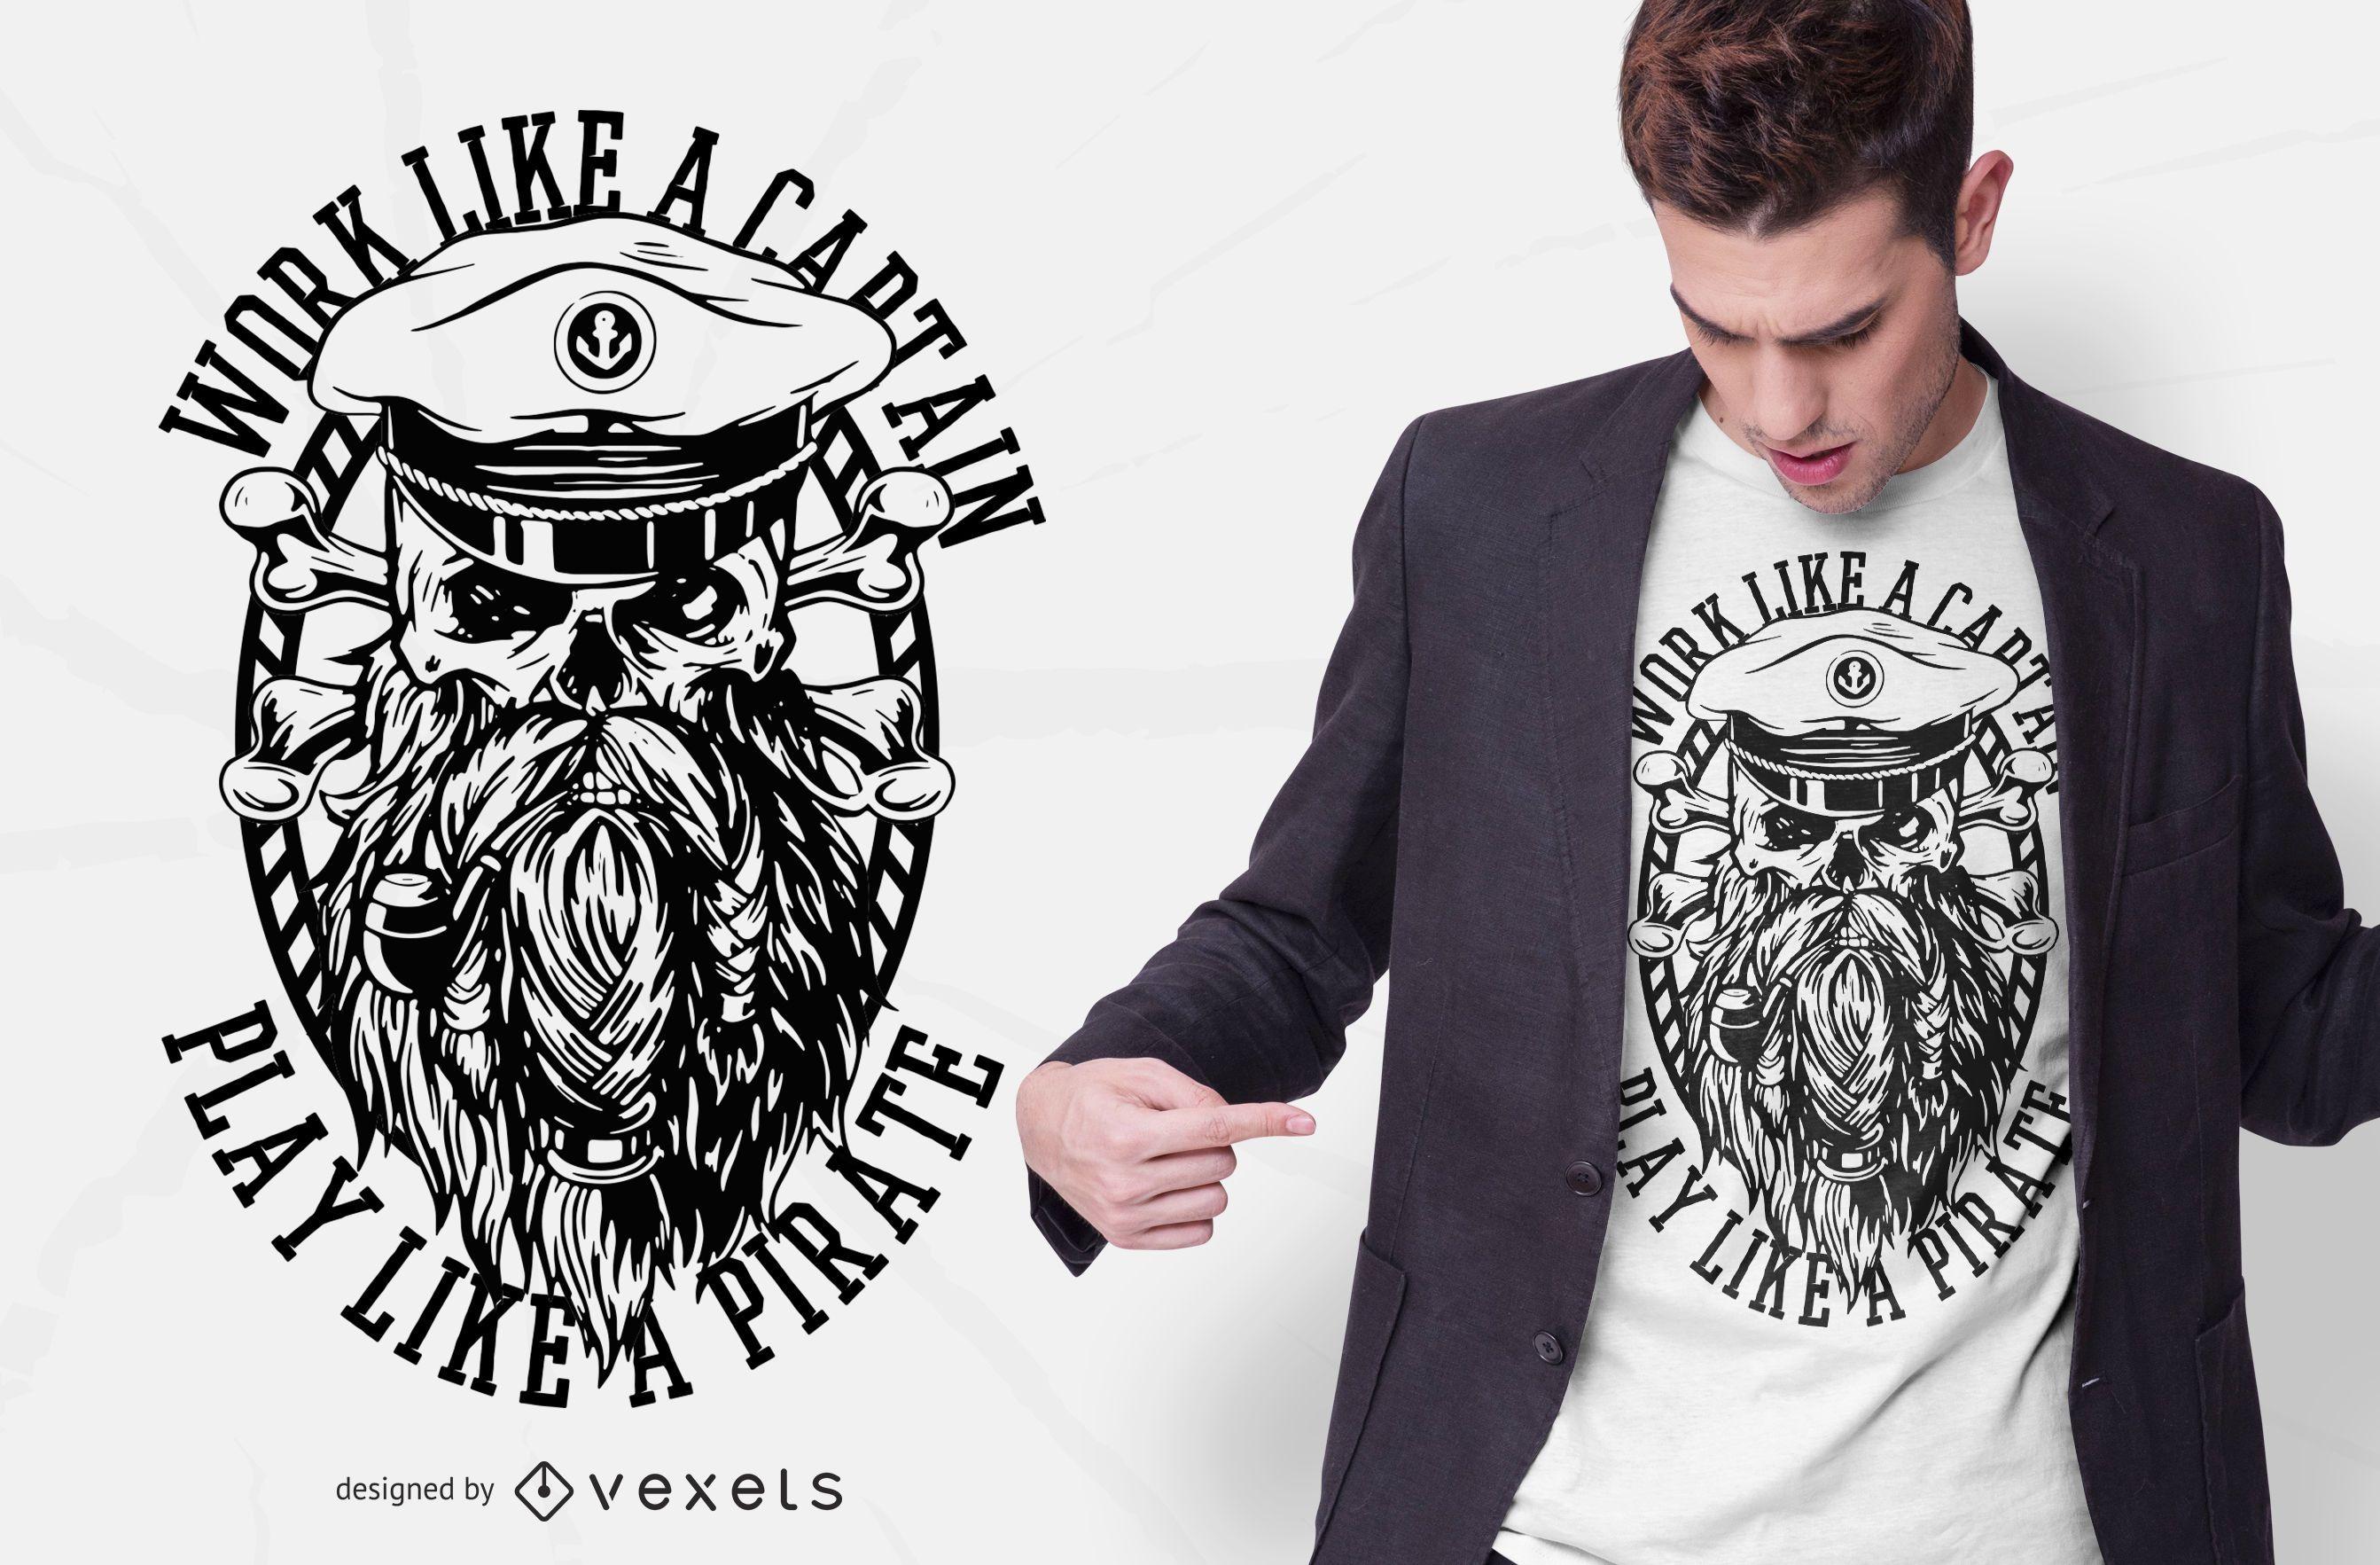 Work Like A Pirate T-shirt Design